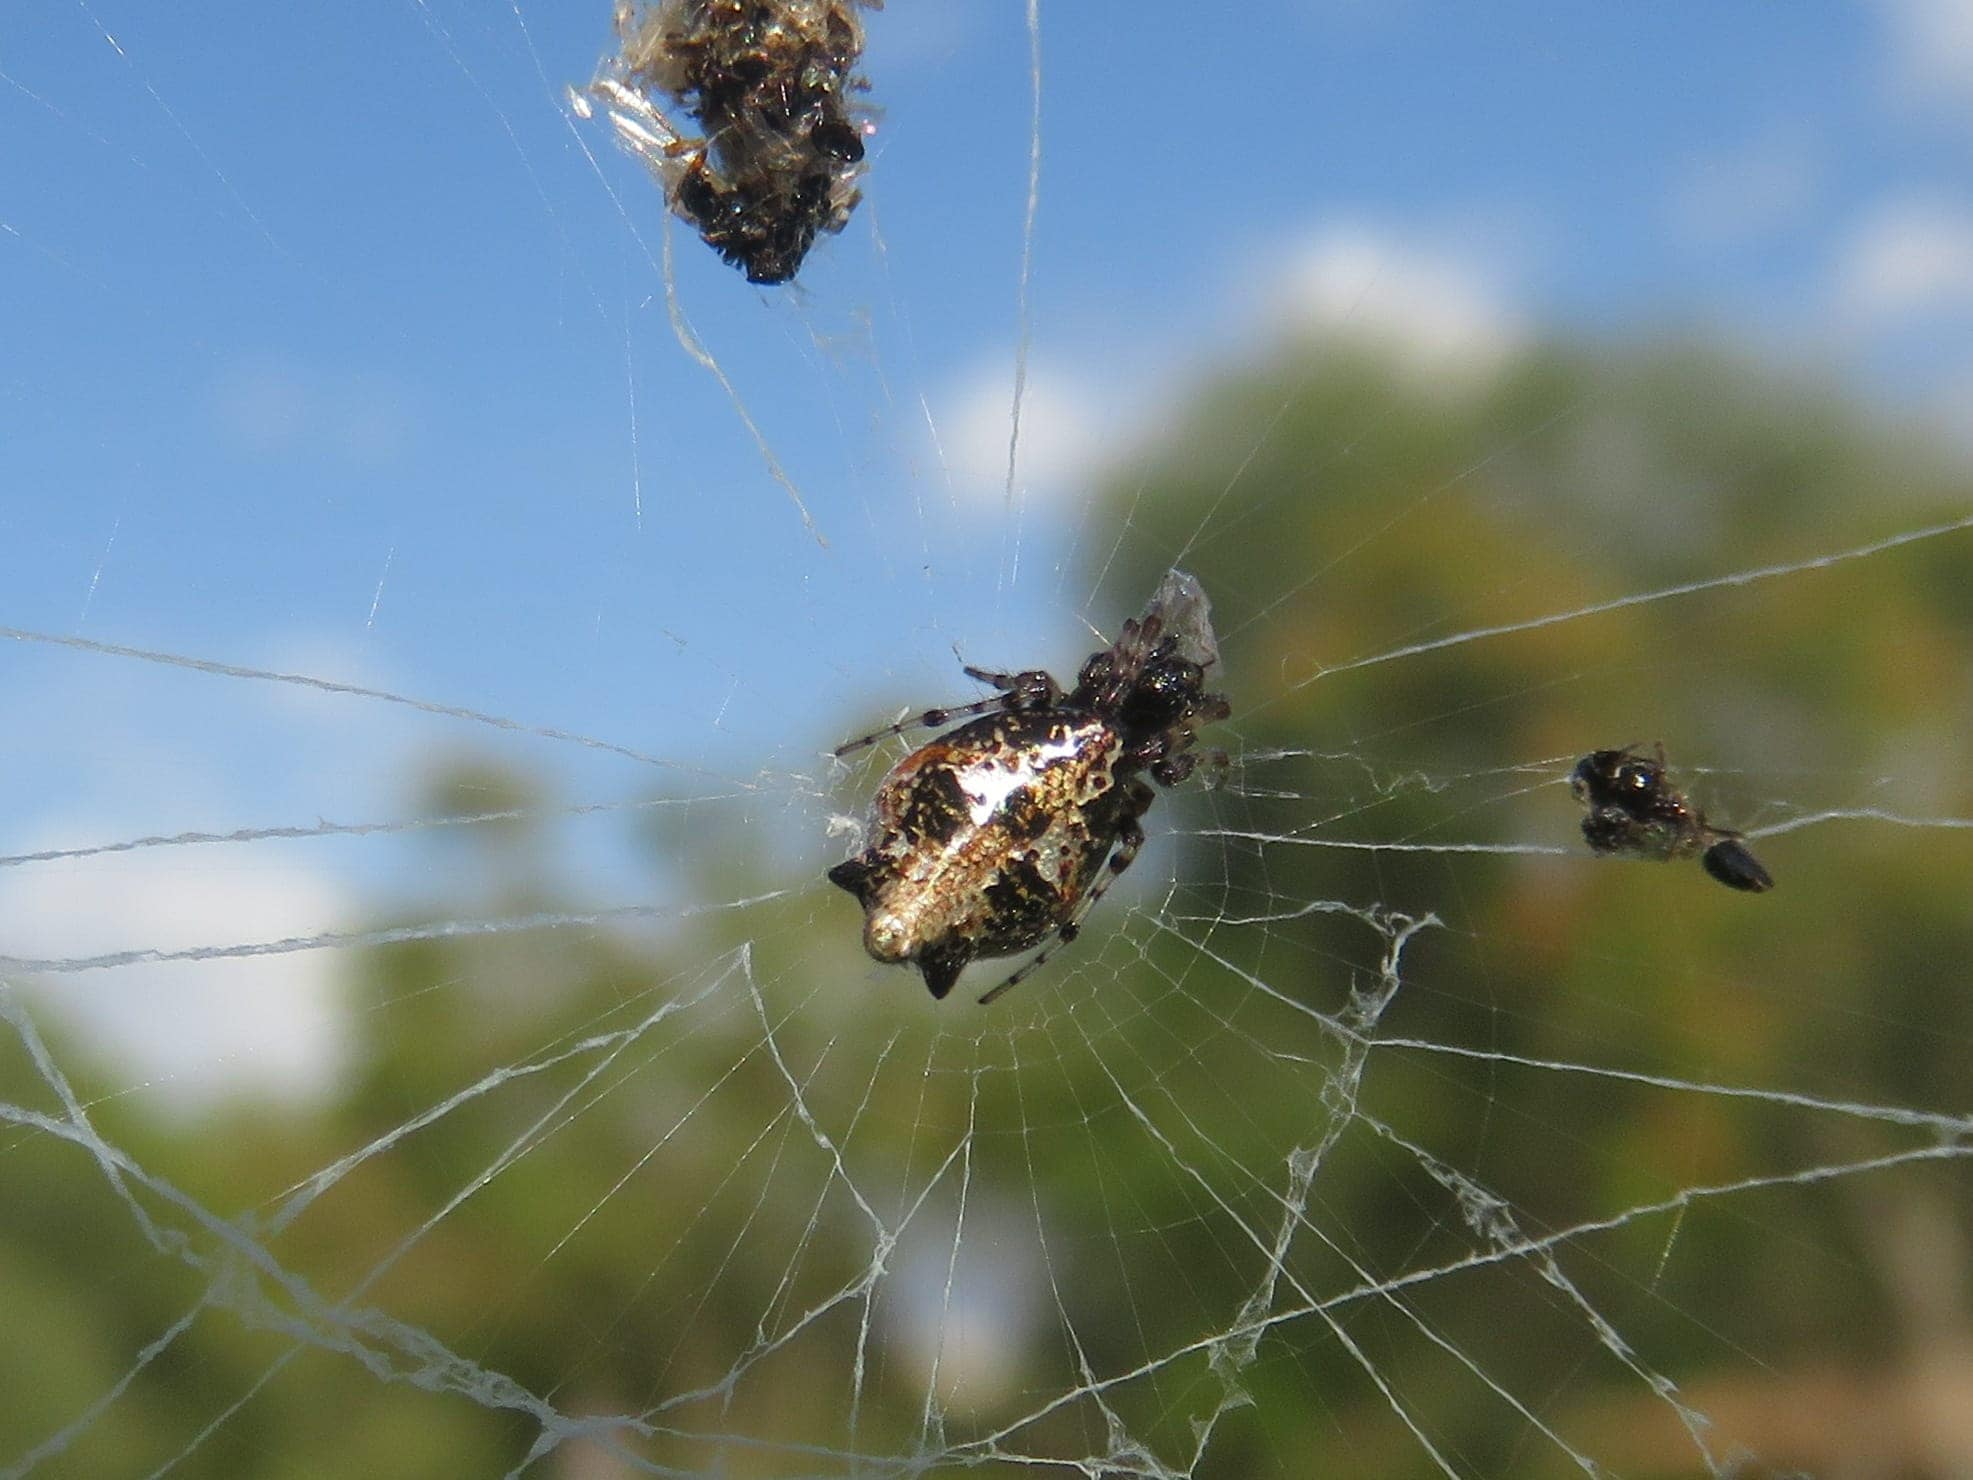 Picture of Cyclosa insulana (Island Cyclosa Spider) - Dorsal,Webs,Prey